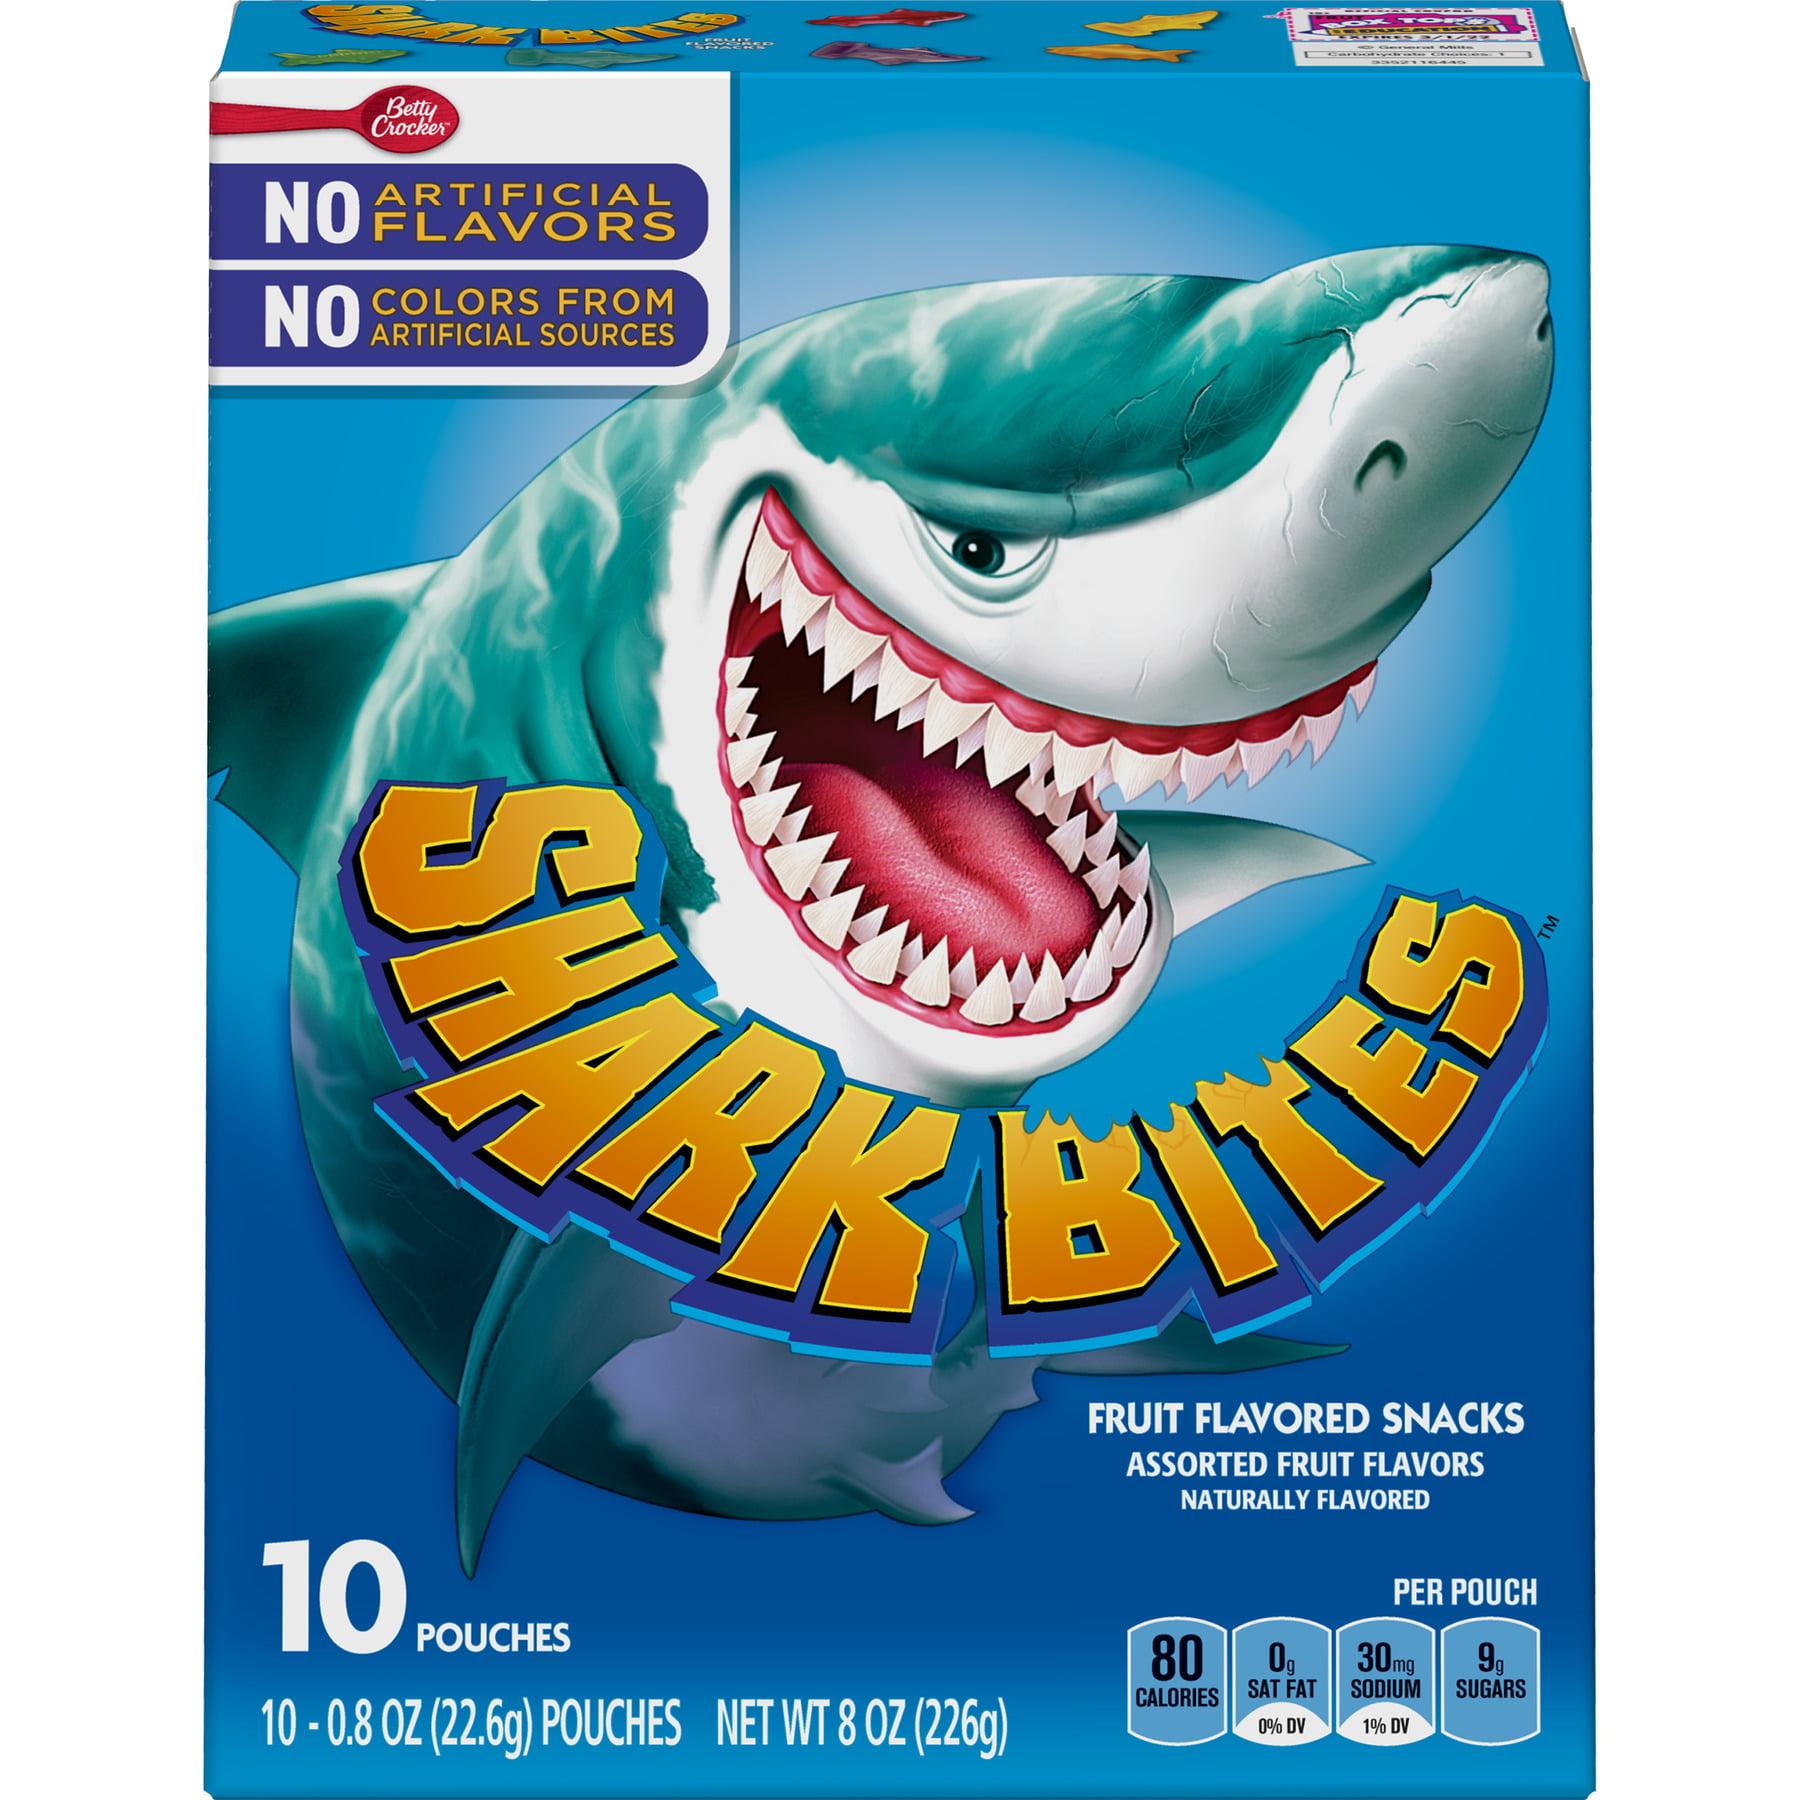 Shark Bites Fruit Flavored Snacks Assorted Flavors 10 ct 8 oz